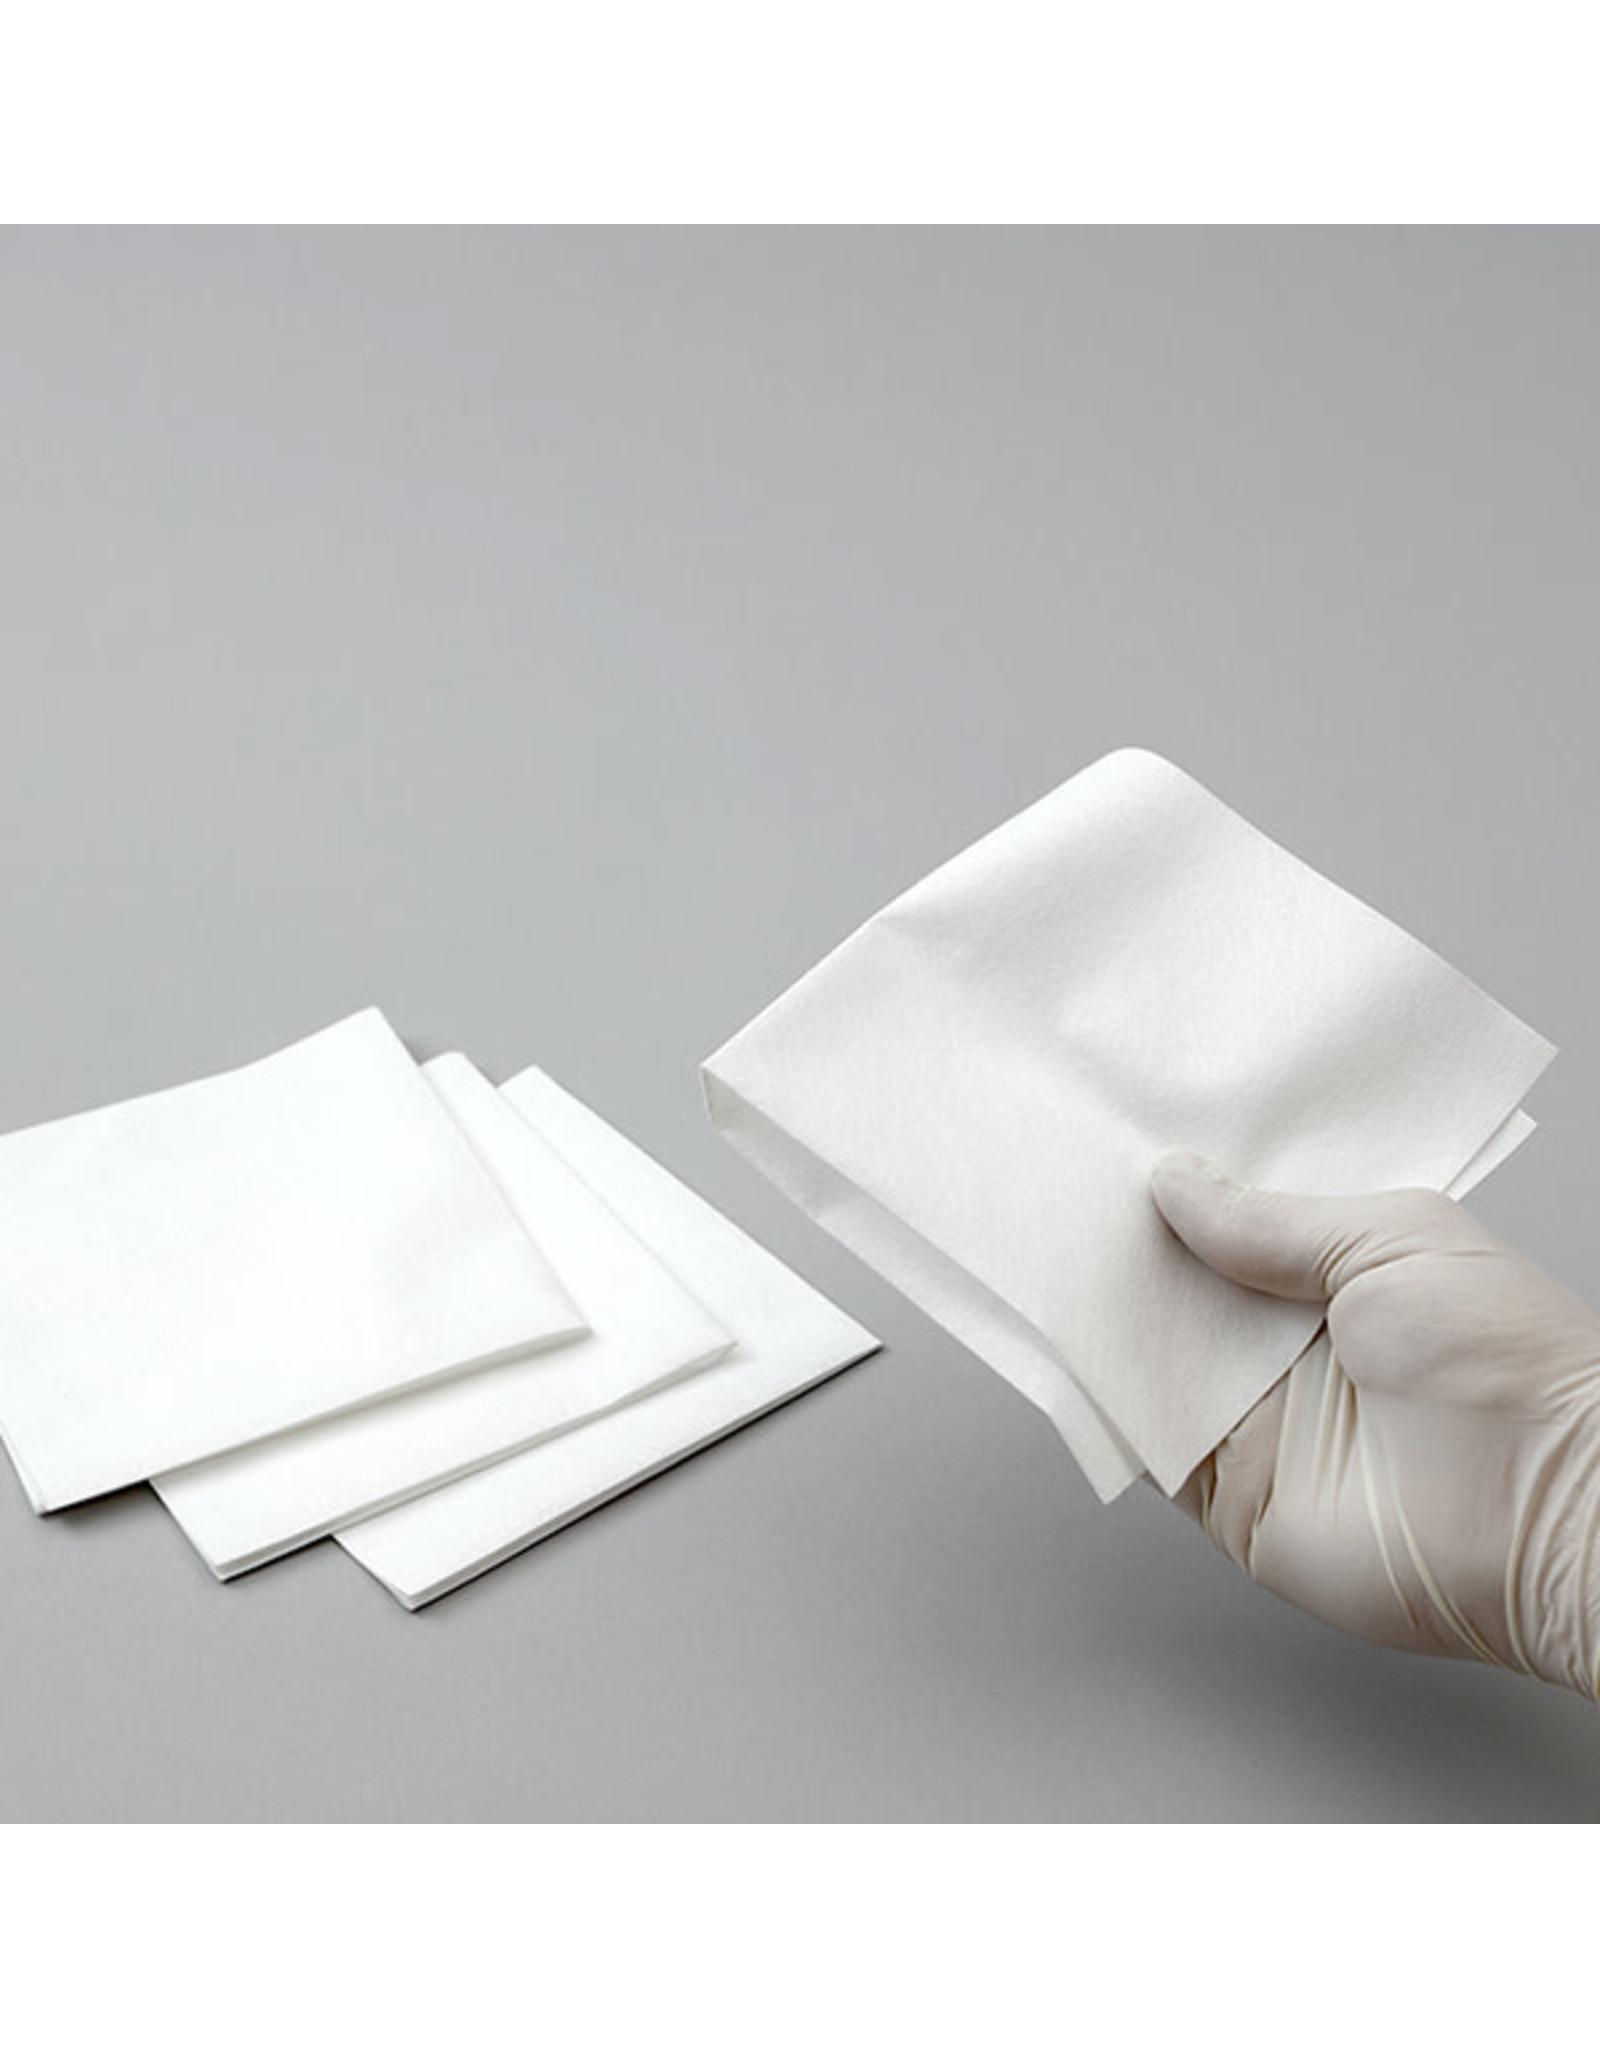 Advantex Single Use Non Woven Microfiber Wipes 50 pack